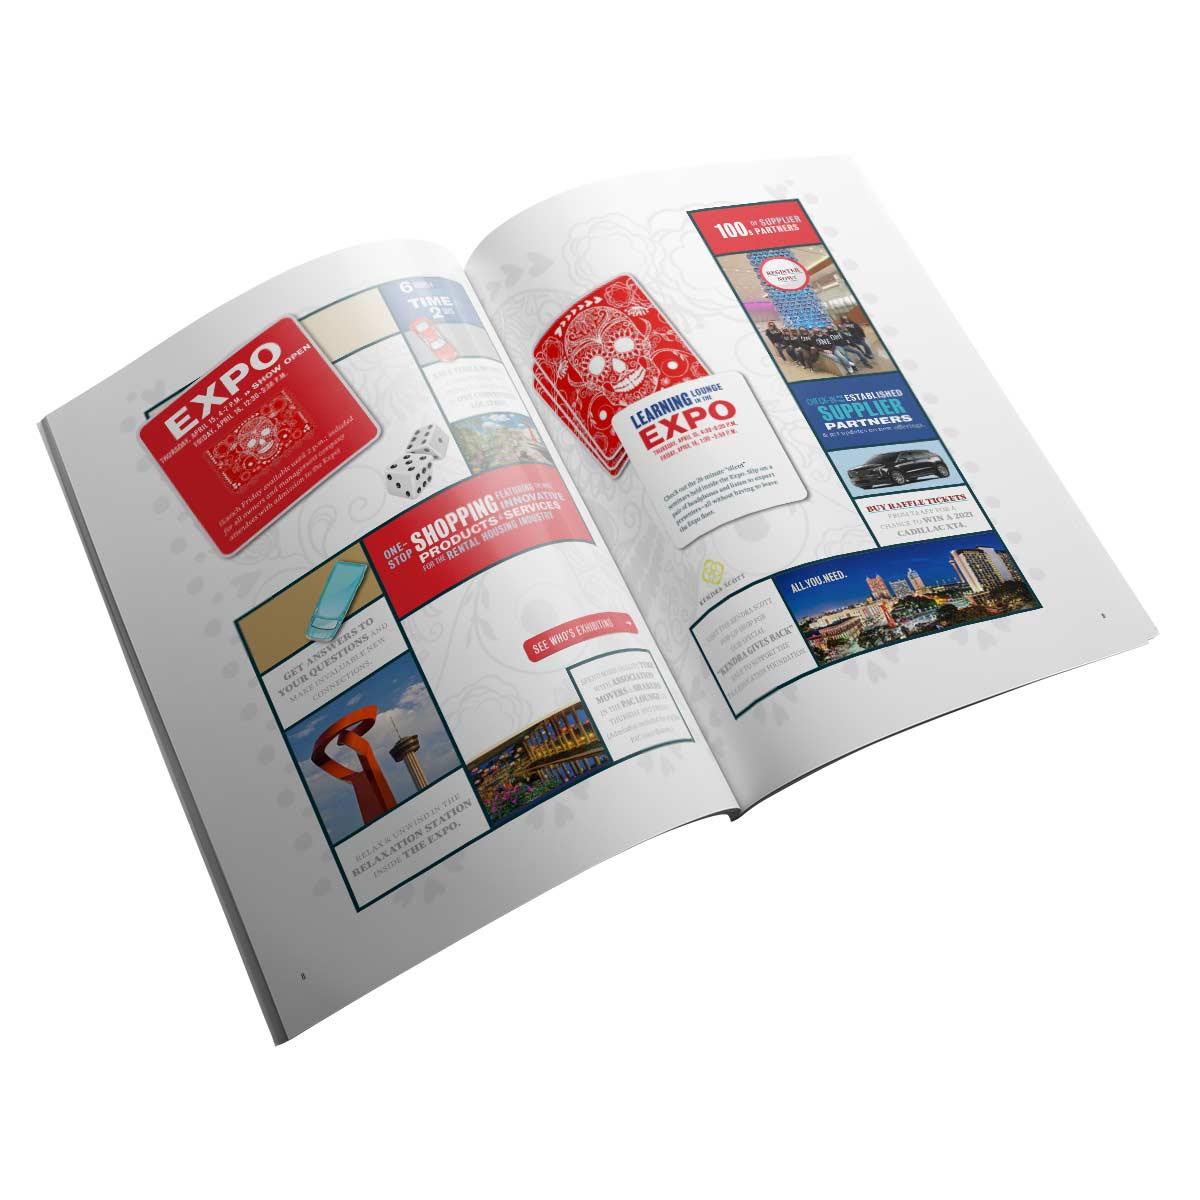 TX One, Texas Apartment Association's 2021 event program layout